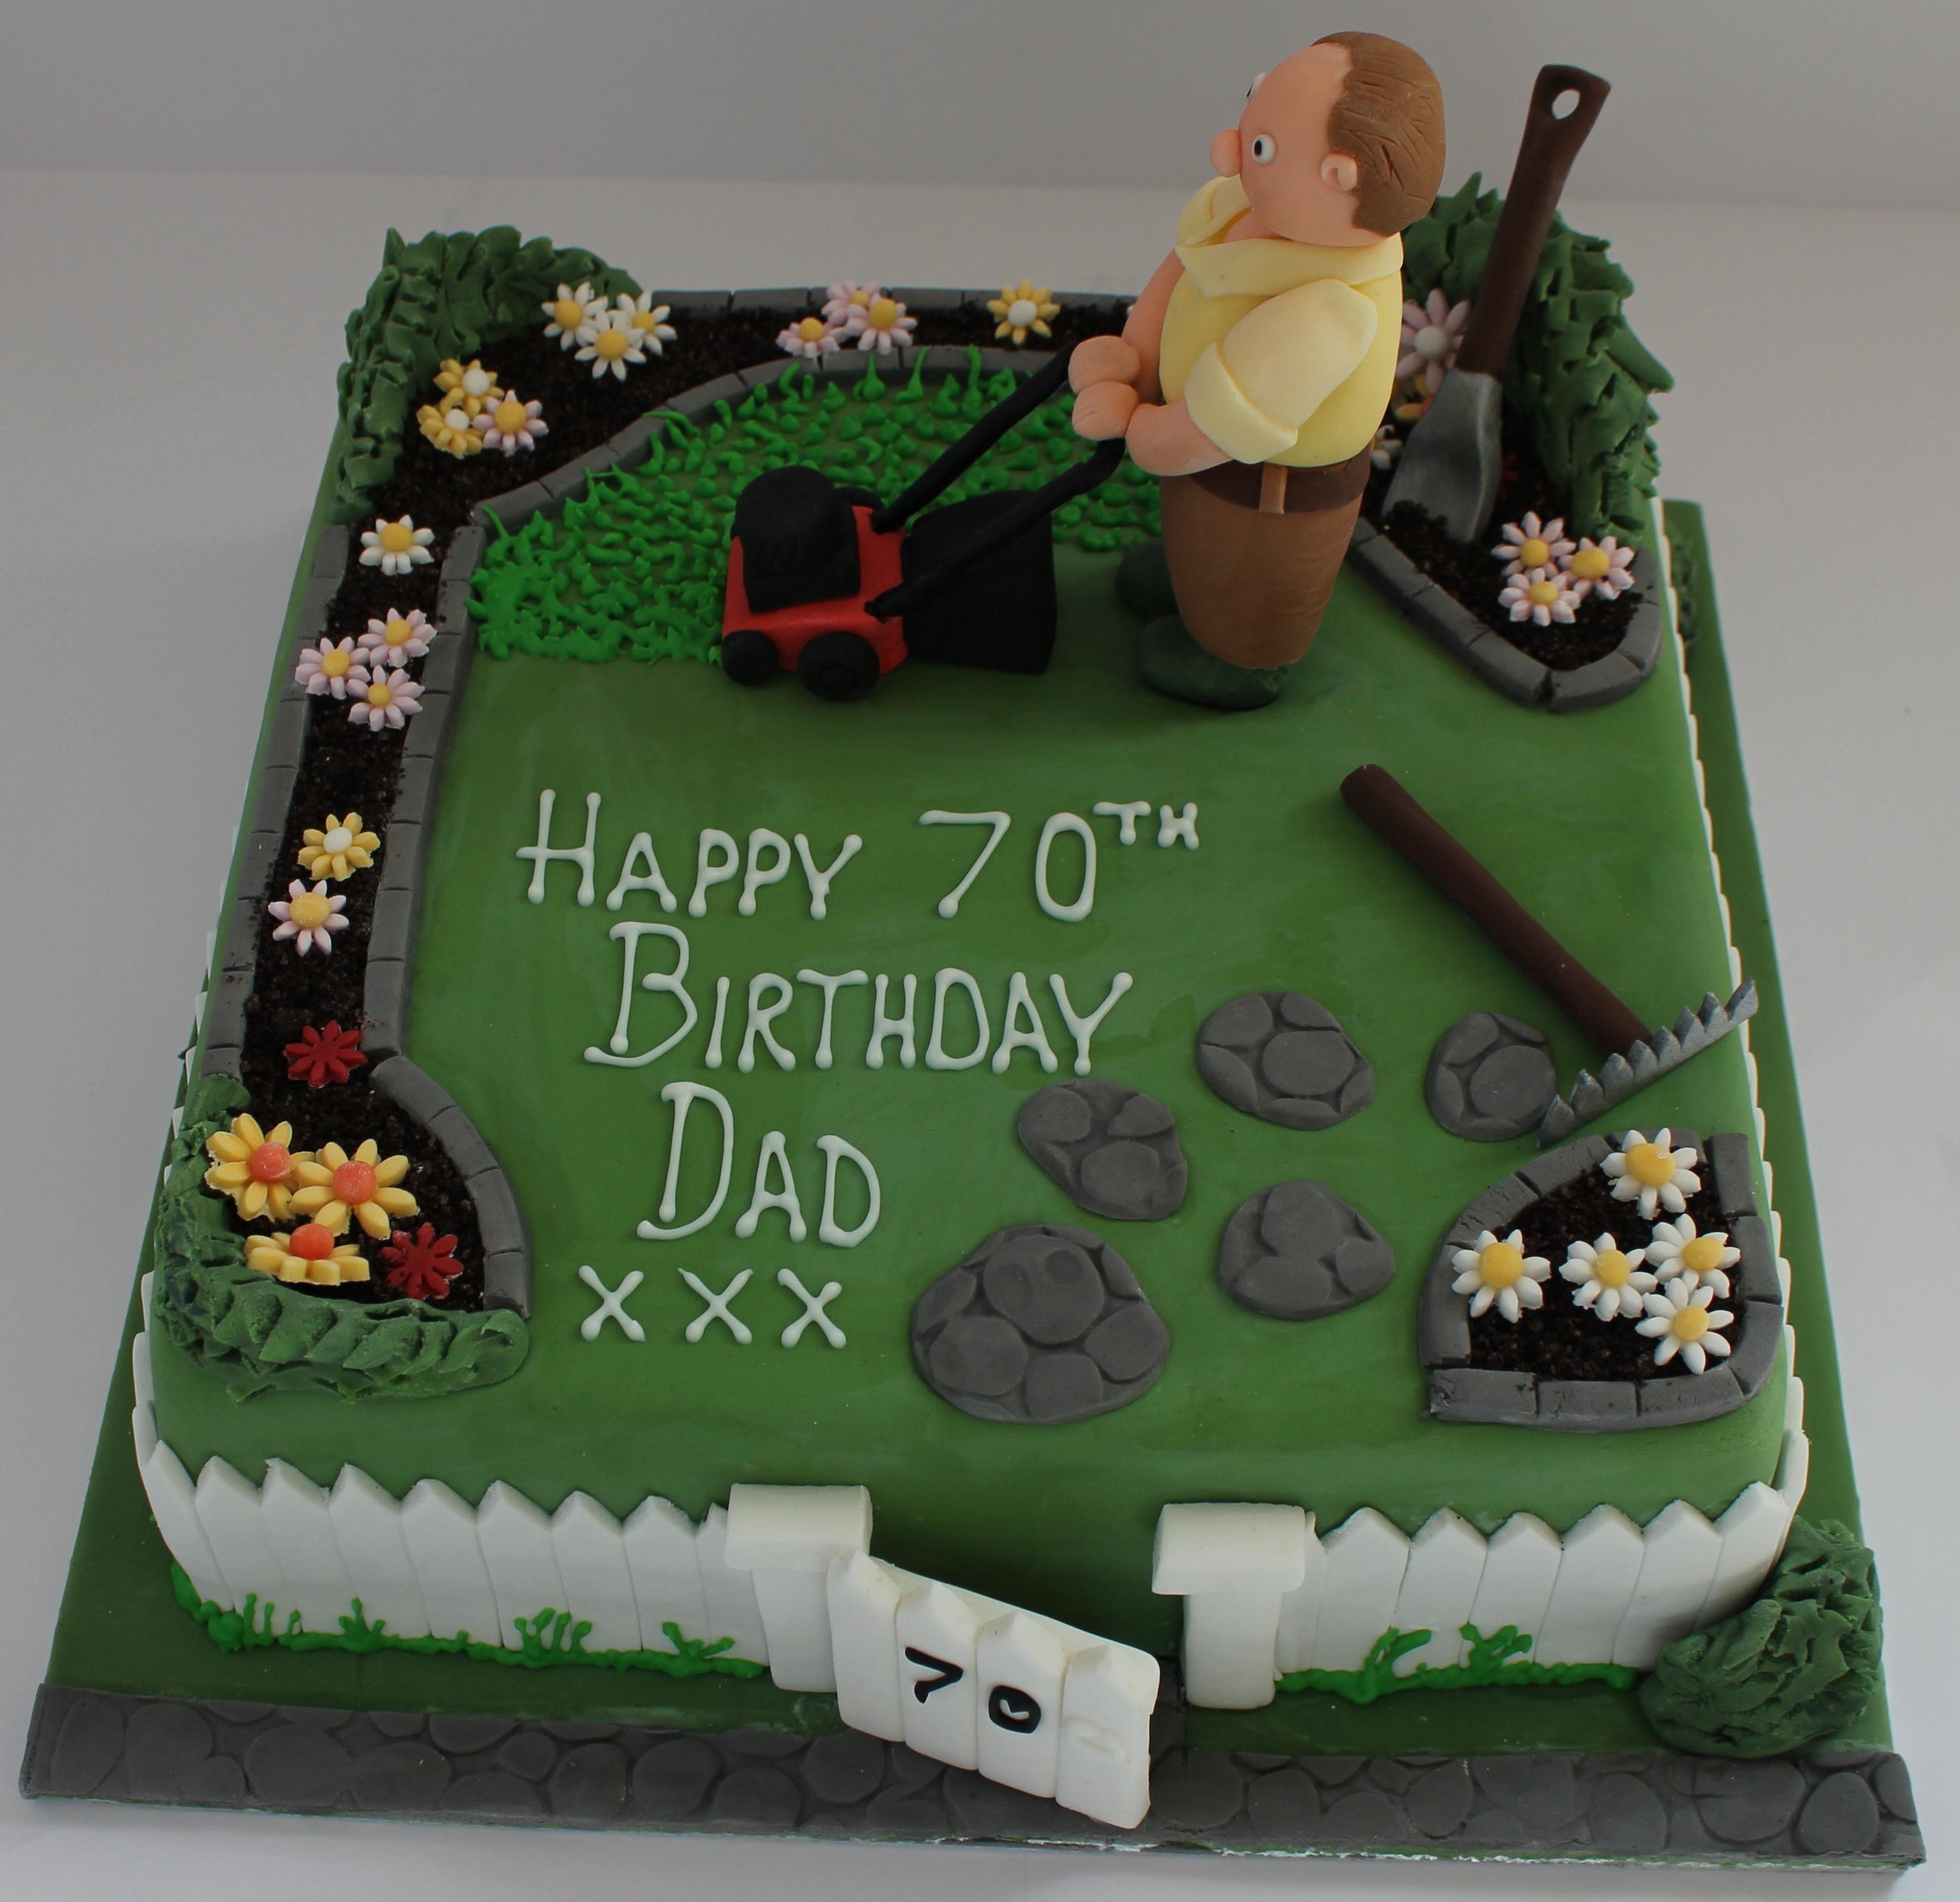 70th Birthday Cake Designs The Best Cake Of 2018